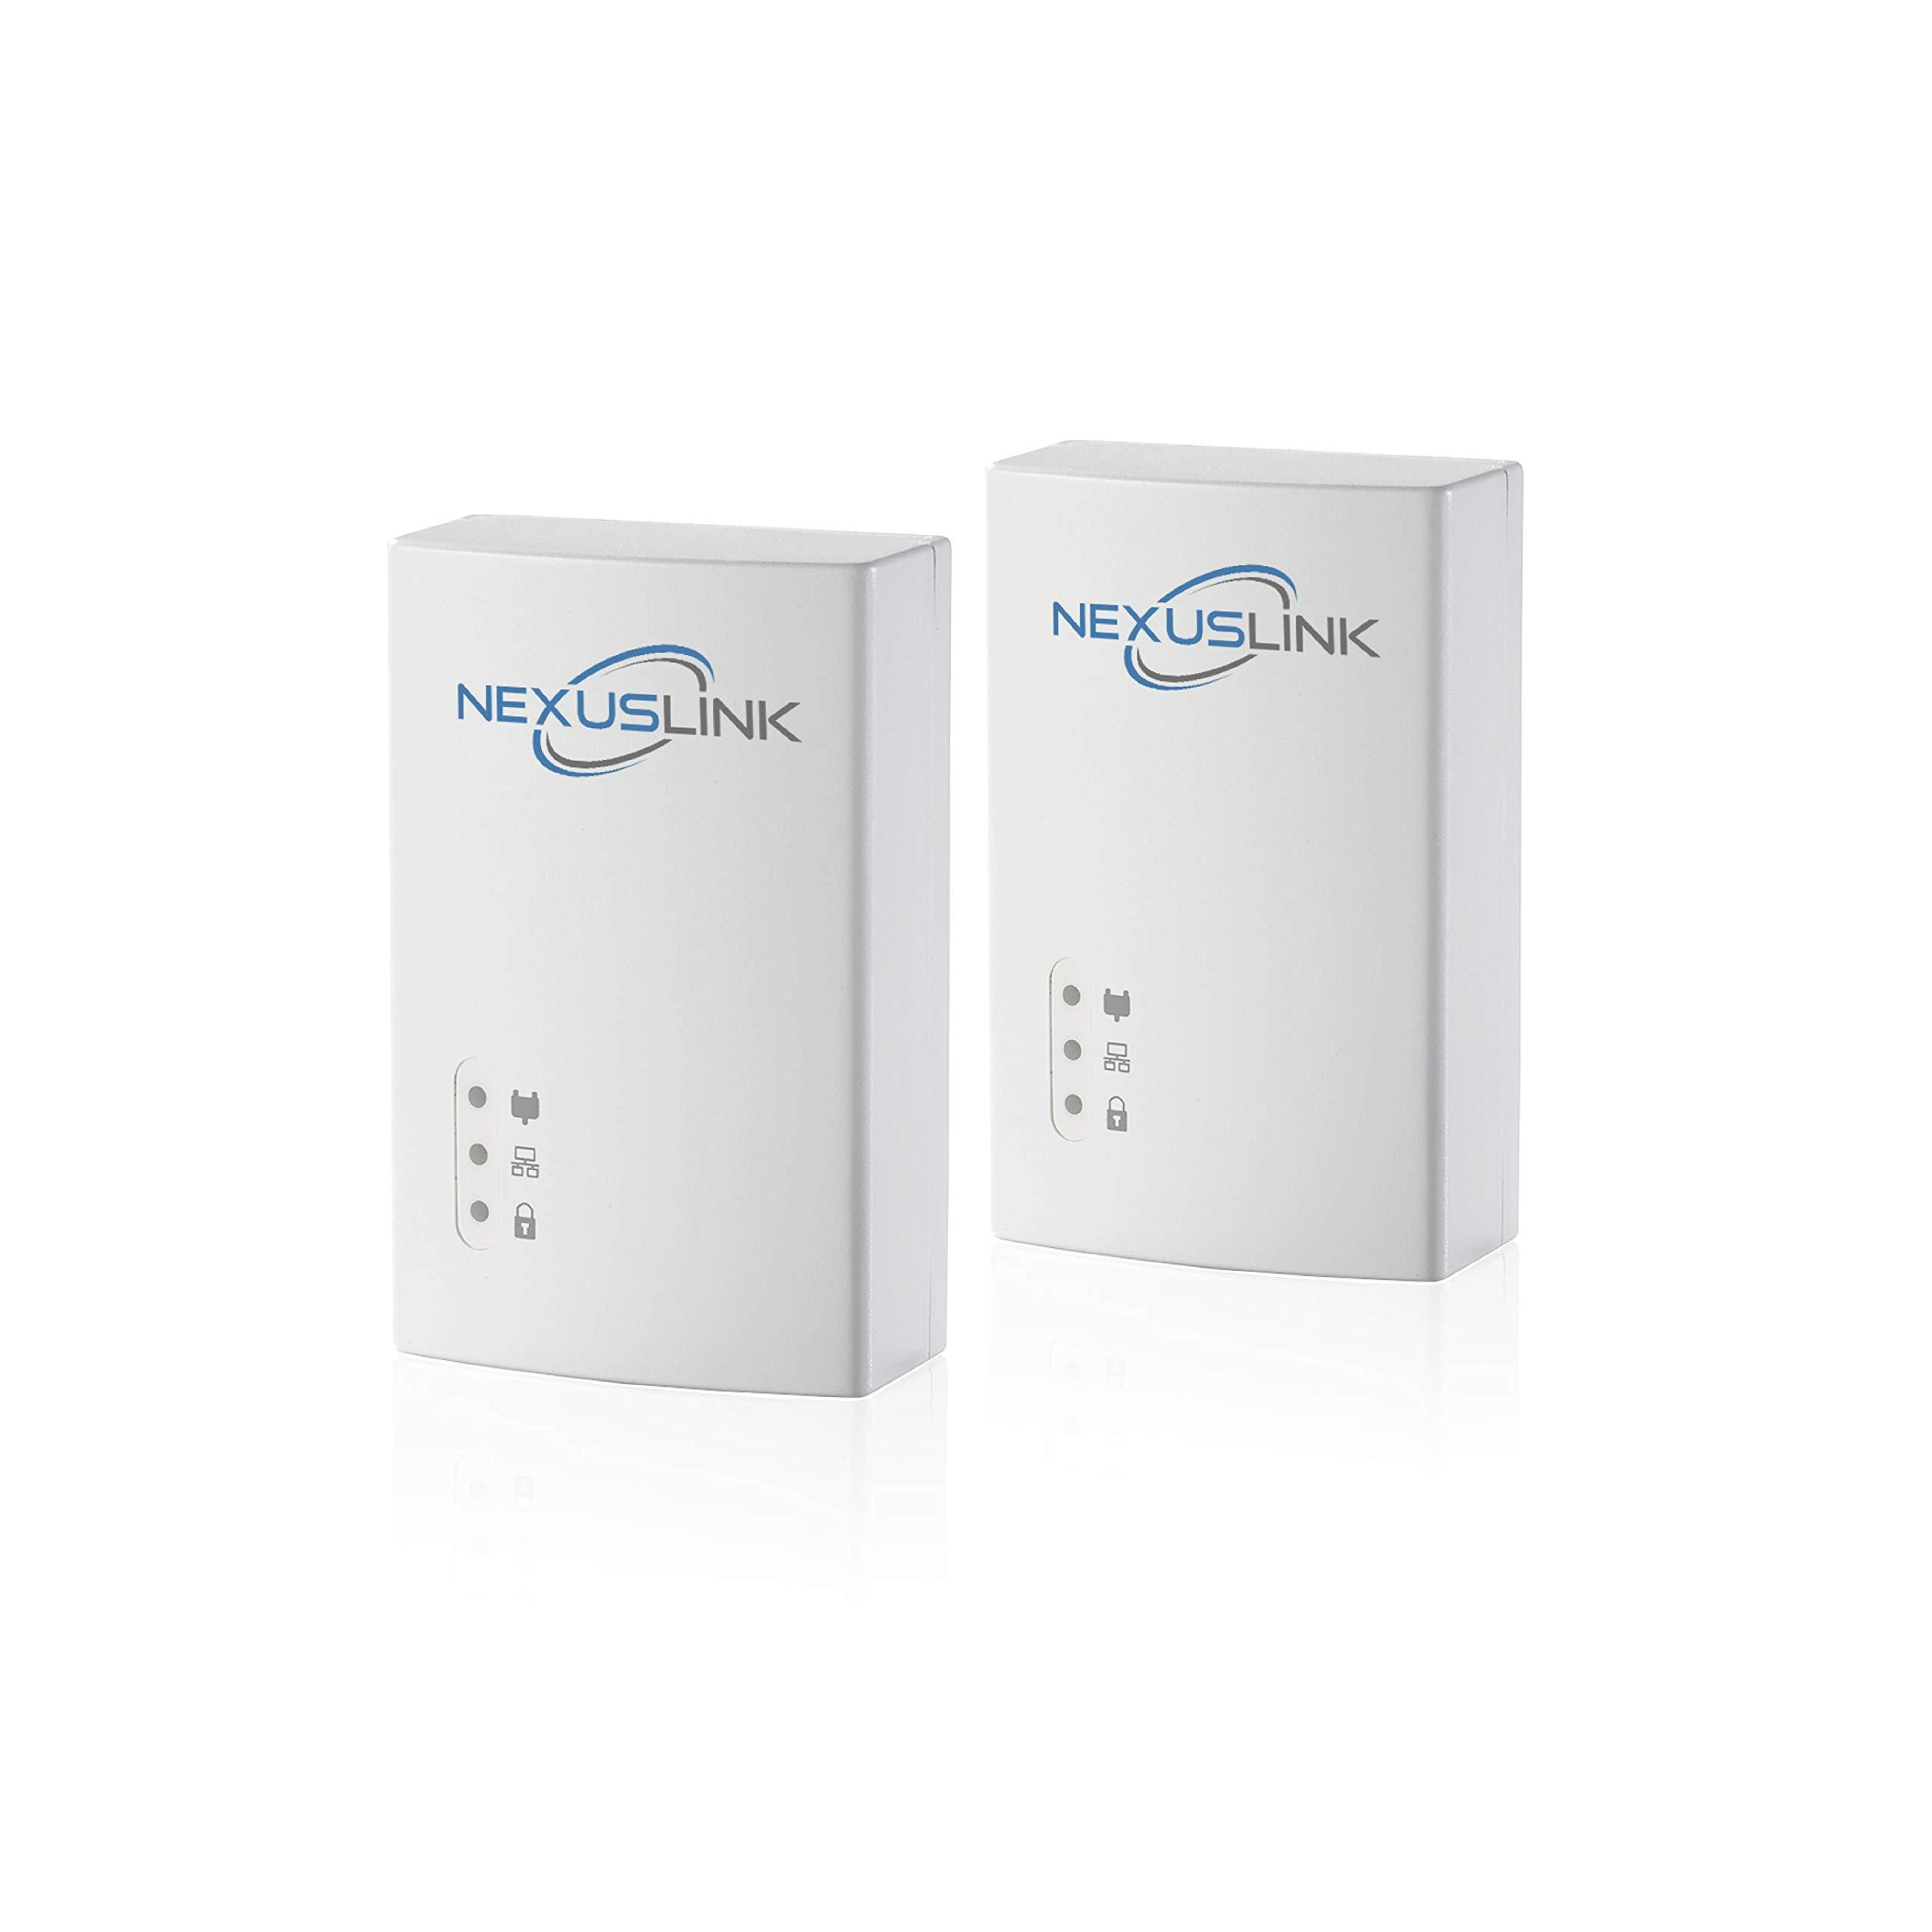 NexusLink Powerline G.hn Powerline Adapter | 1200Mbps | 2-Unit Kit (GPL-1200-KIT)